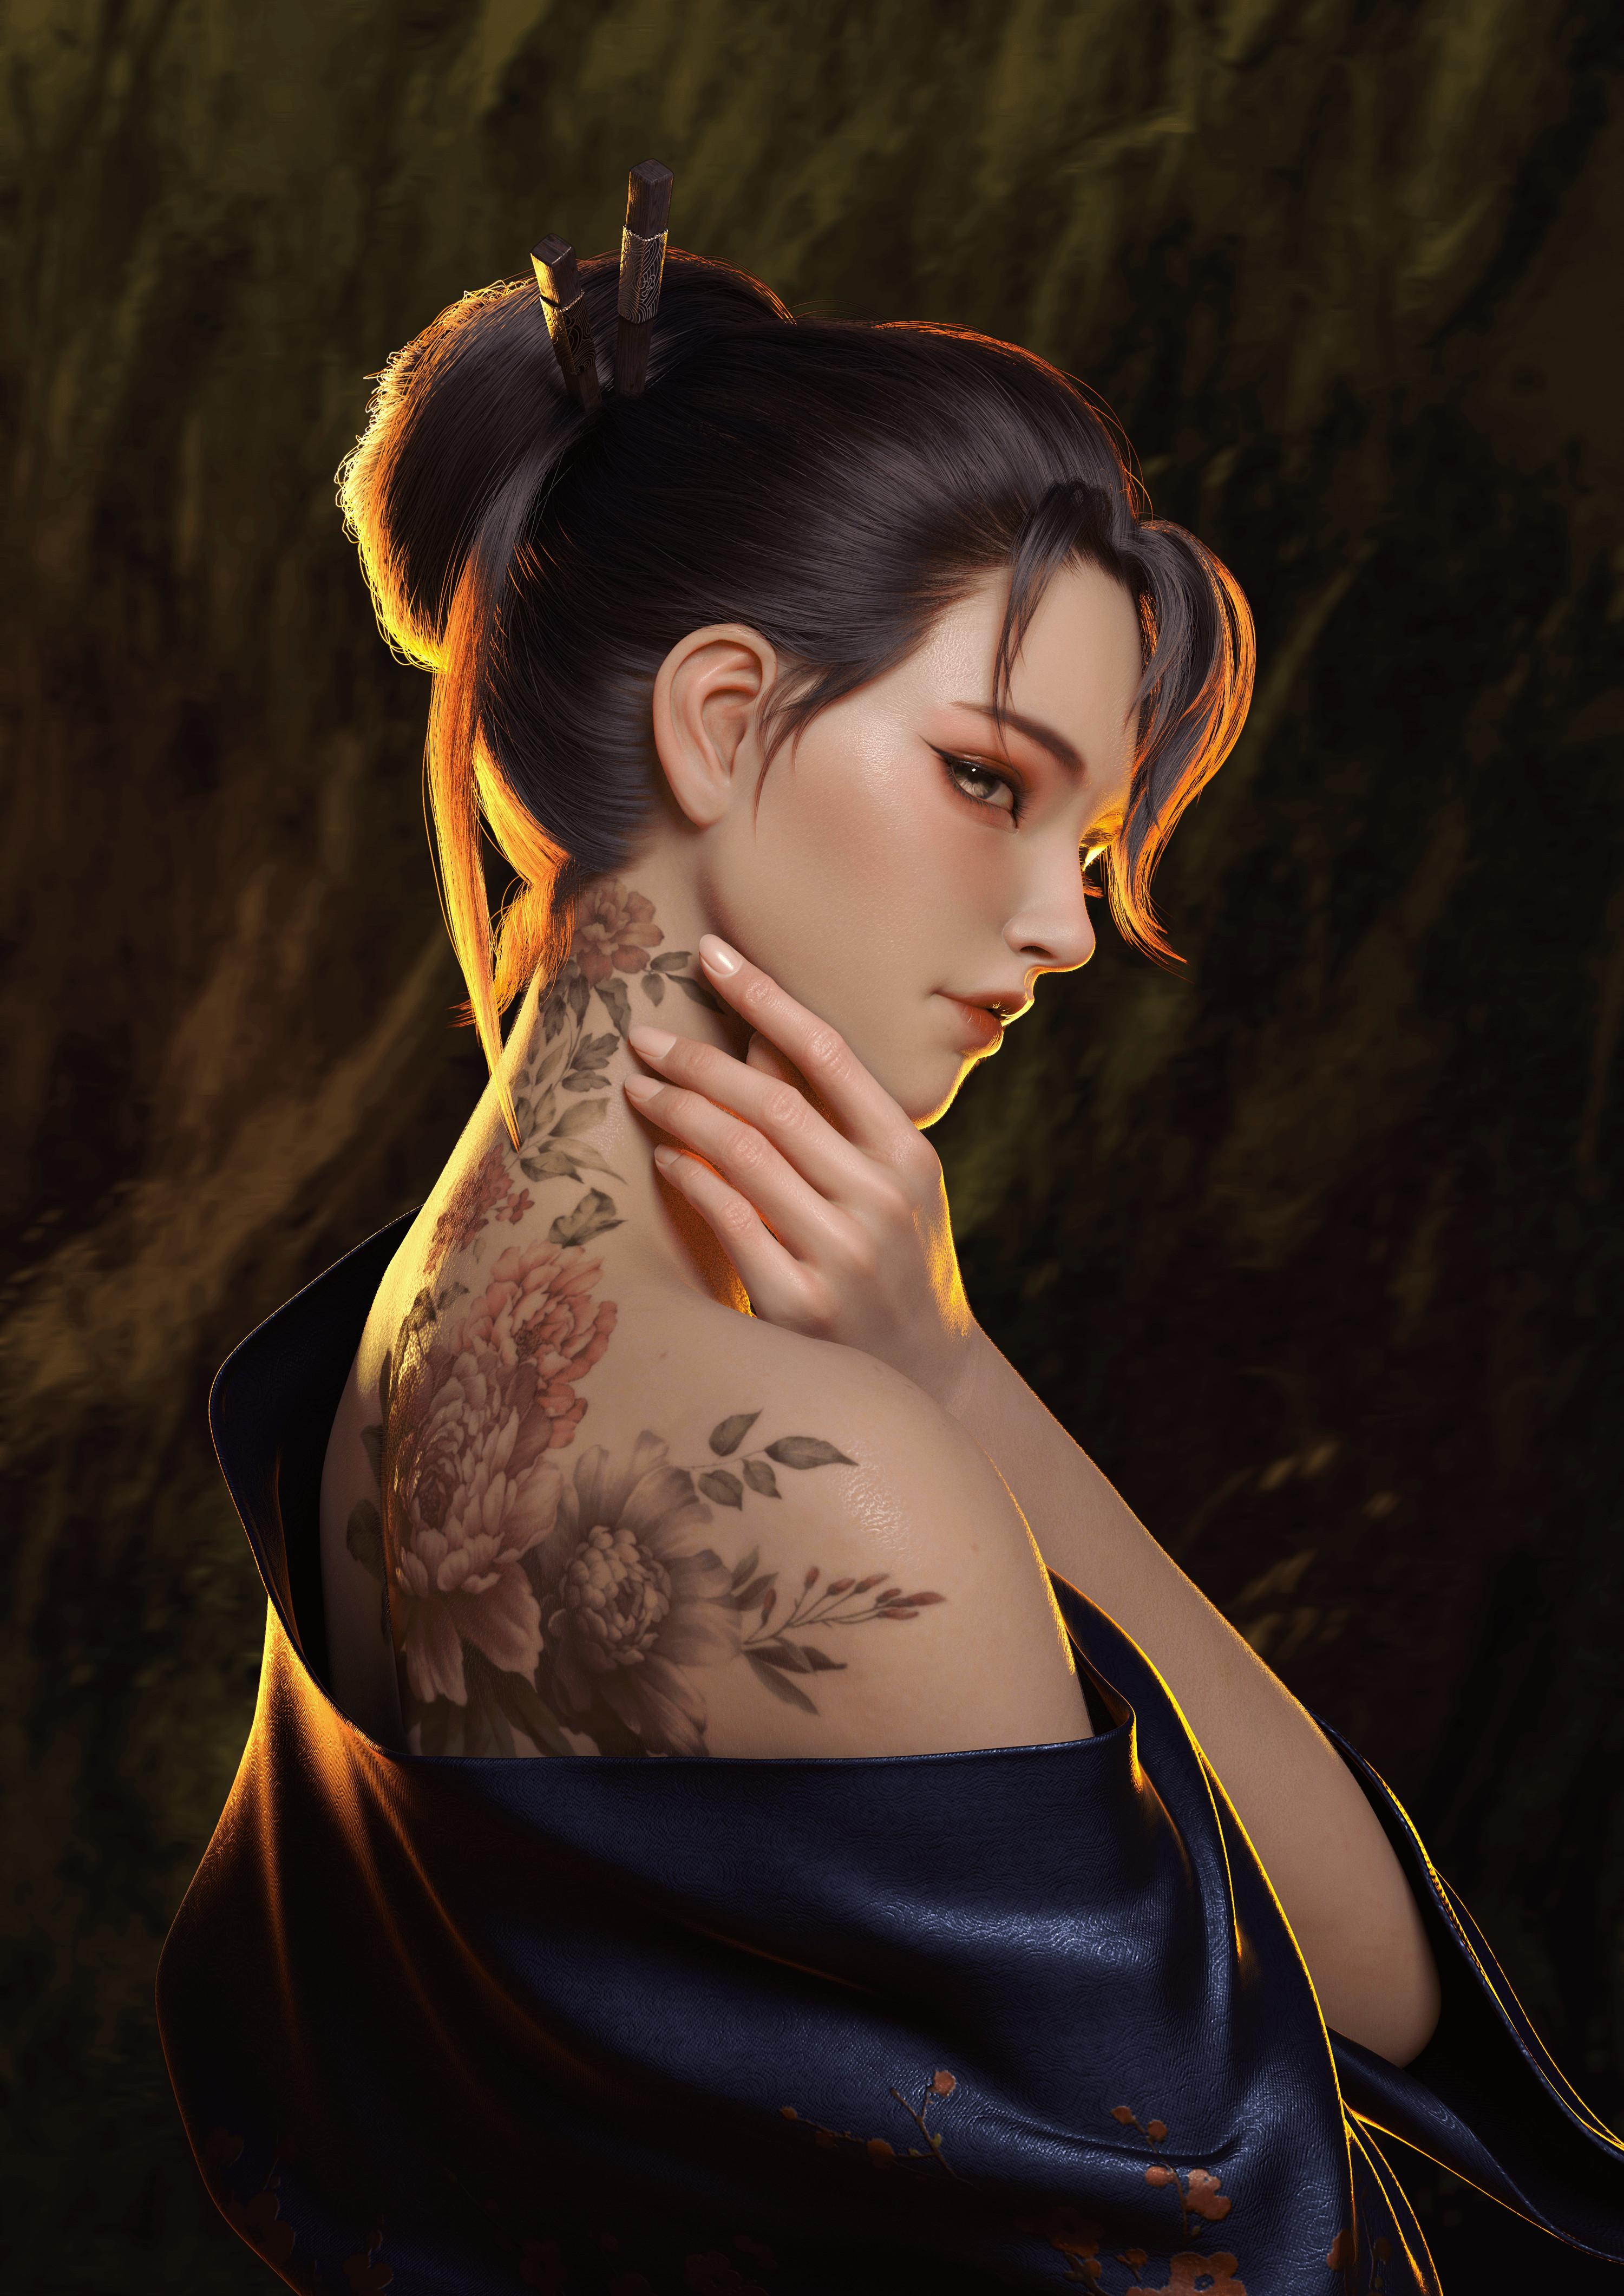 General 3000x4241 women brunette robes artwork